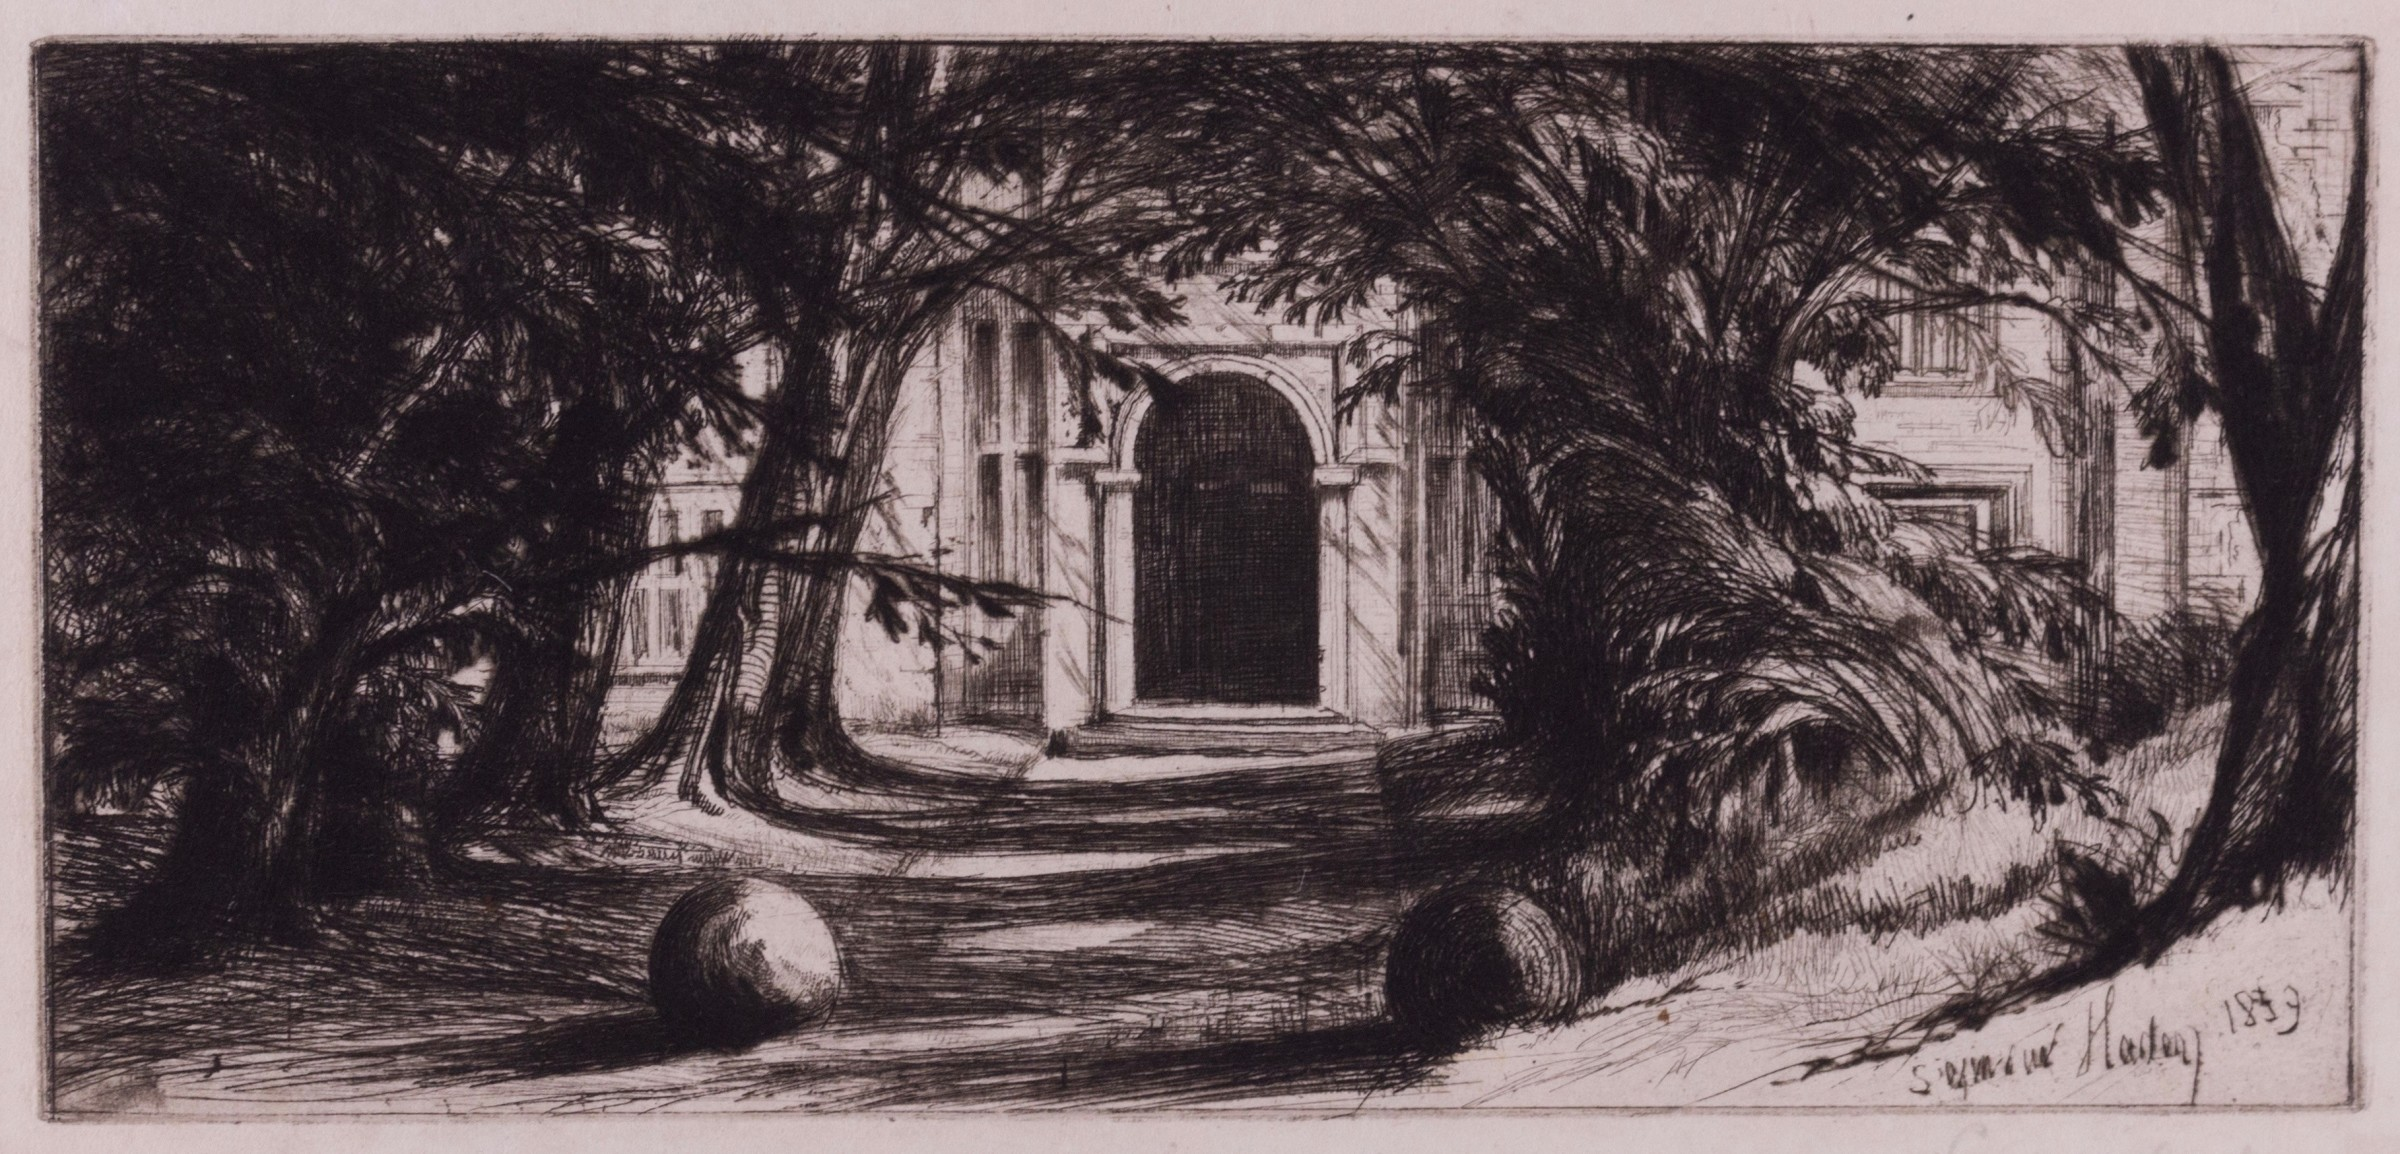 "<span class=""link fancybox-details-link""><a href=""/exhibitions/11/works/image_standalone96/"">View Detail Page</a></span><p>SIR FRANCIS SEYMOUR HADEN (1818 - 1910)</p><p><em></em></p><p><em>Mytton Hall, 1859</em></p><p>drypoint</p>"